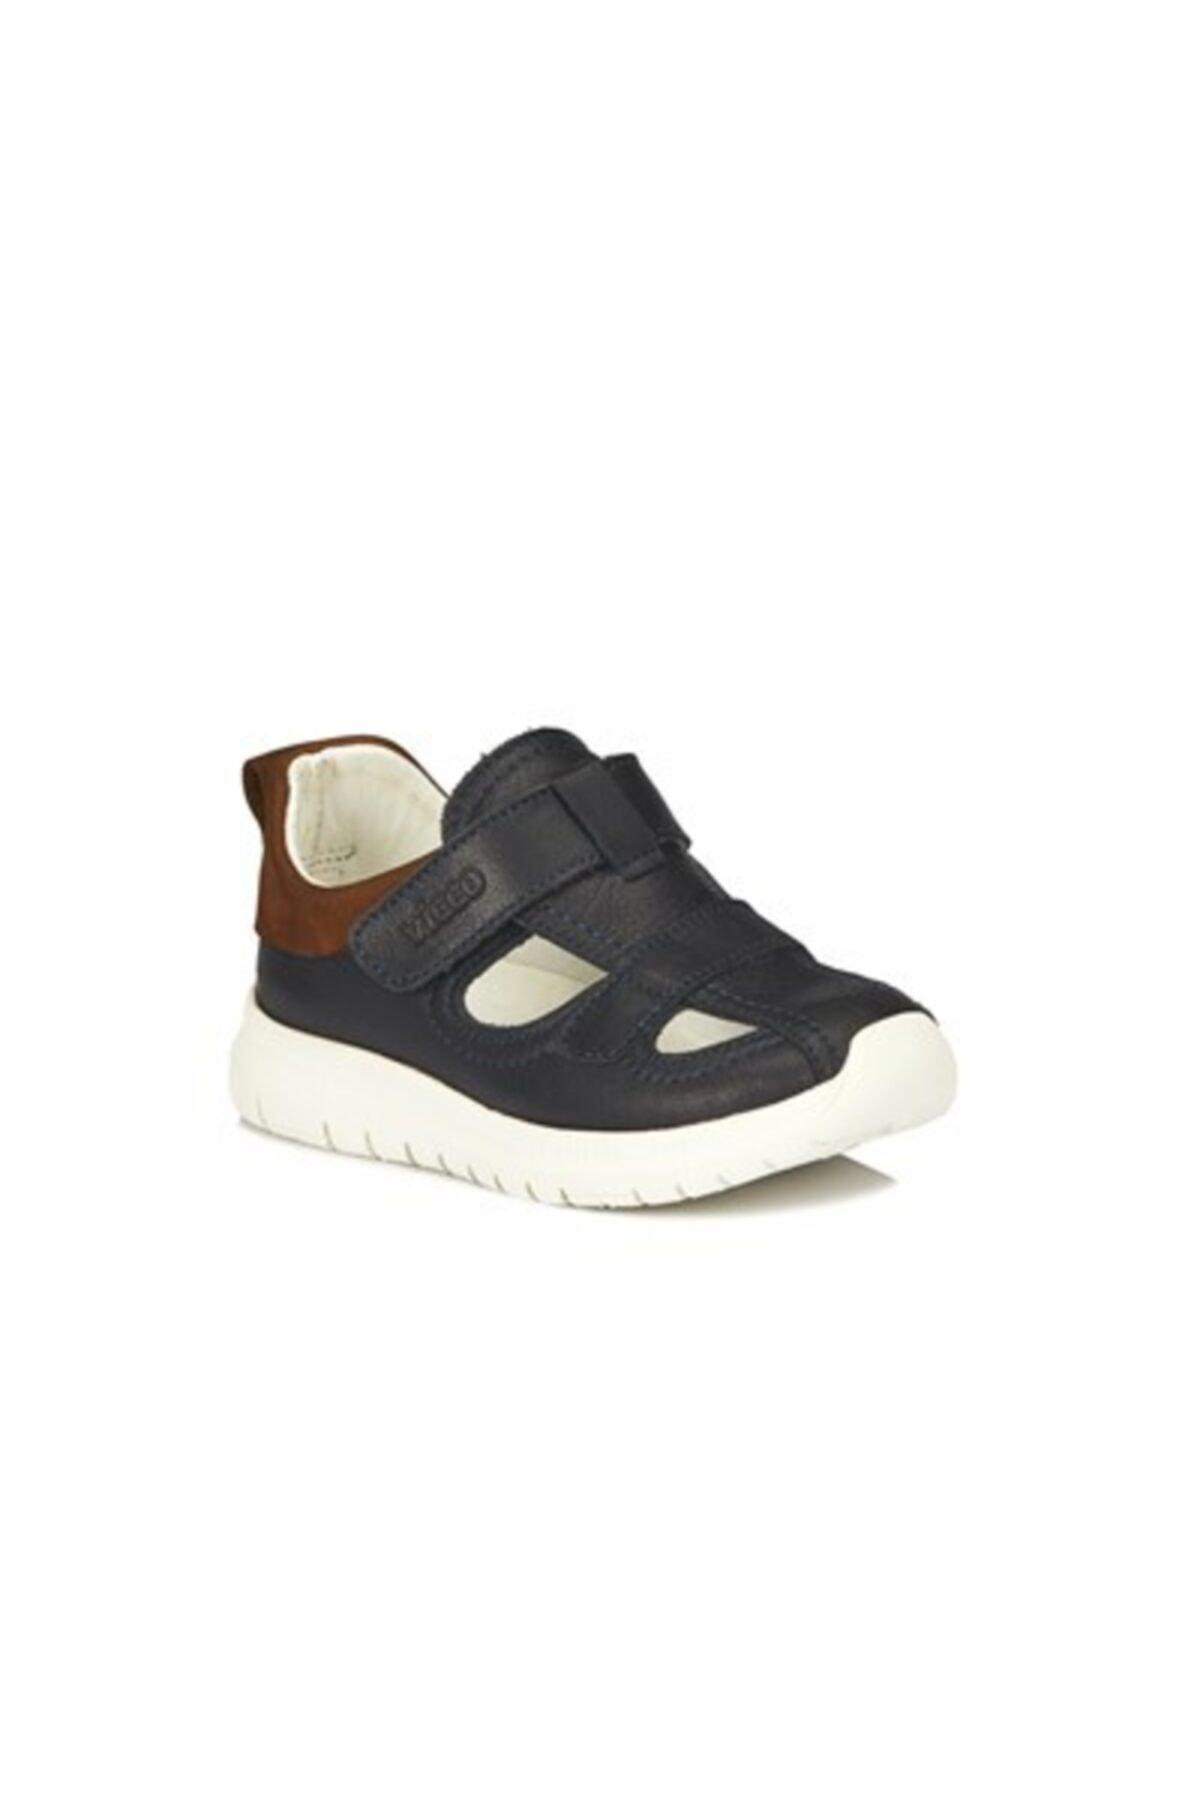 Vicco Aspen 910.b20y.051 Bebe Deri Ayakkabı 1